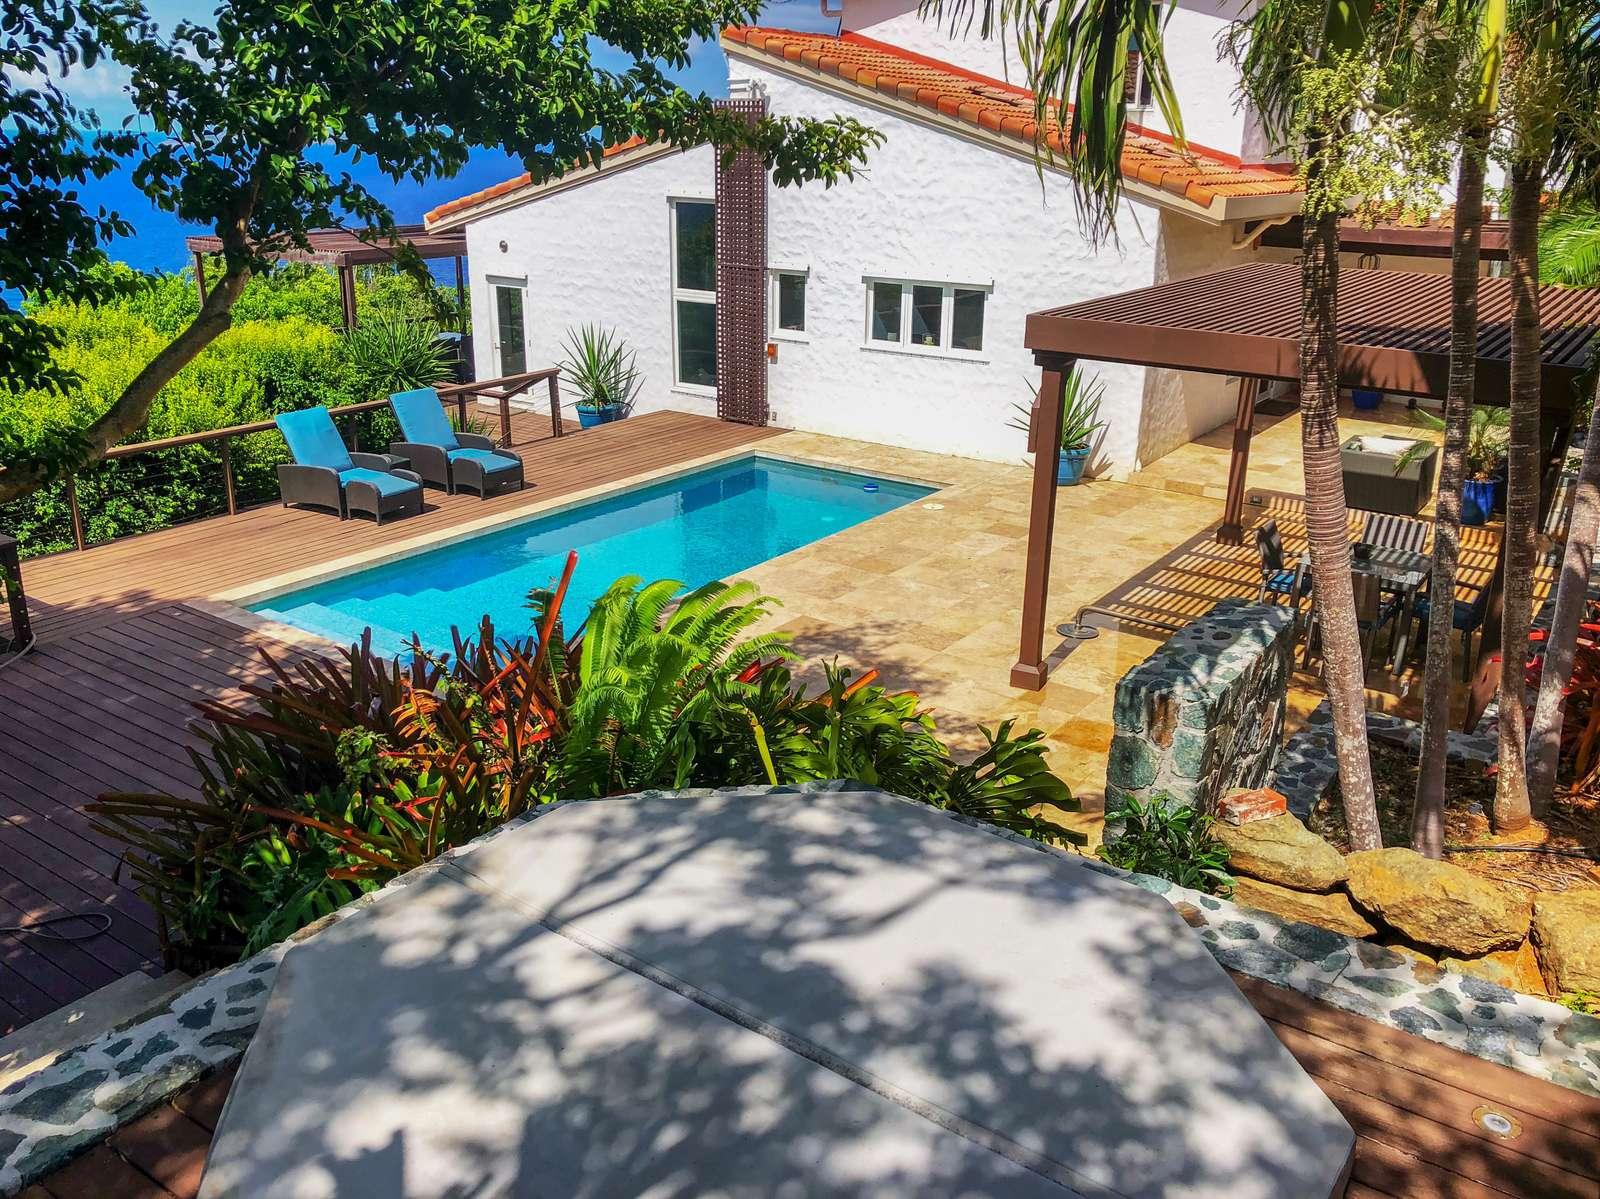 Spacious pool deck and hot tub